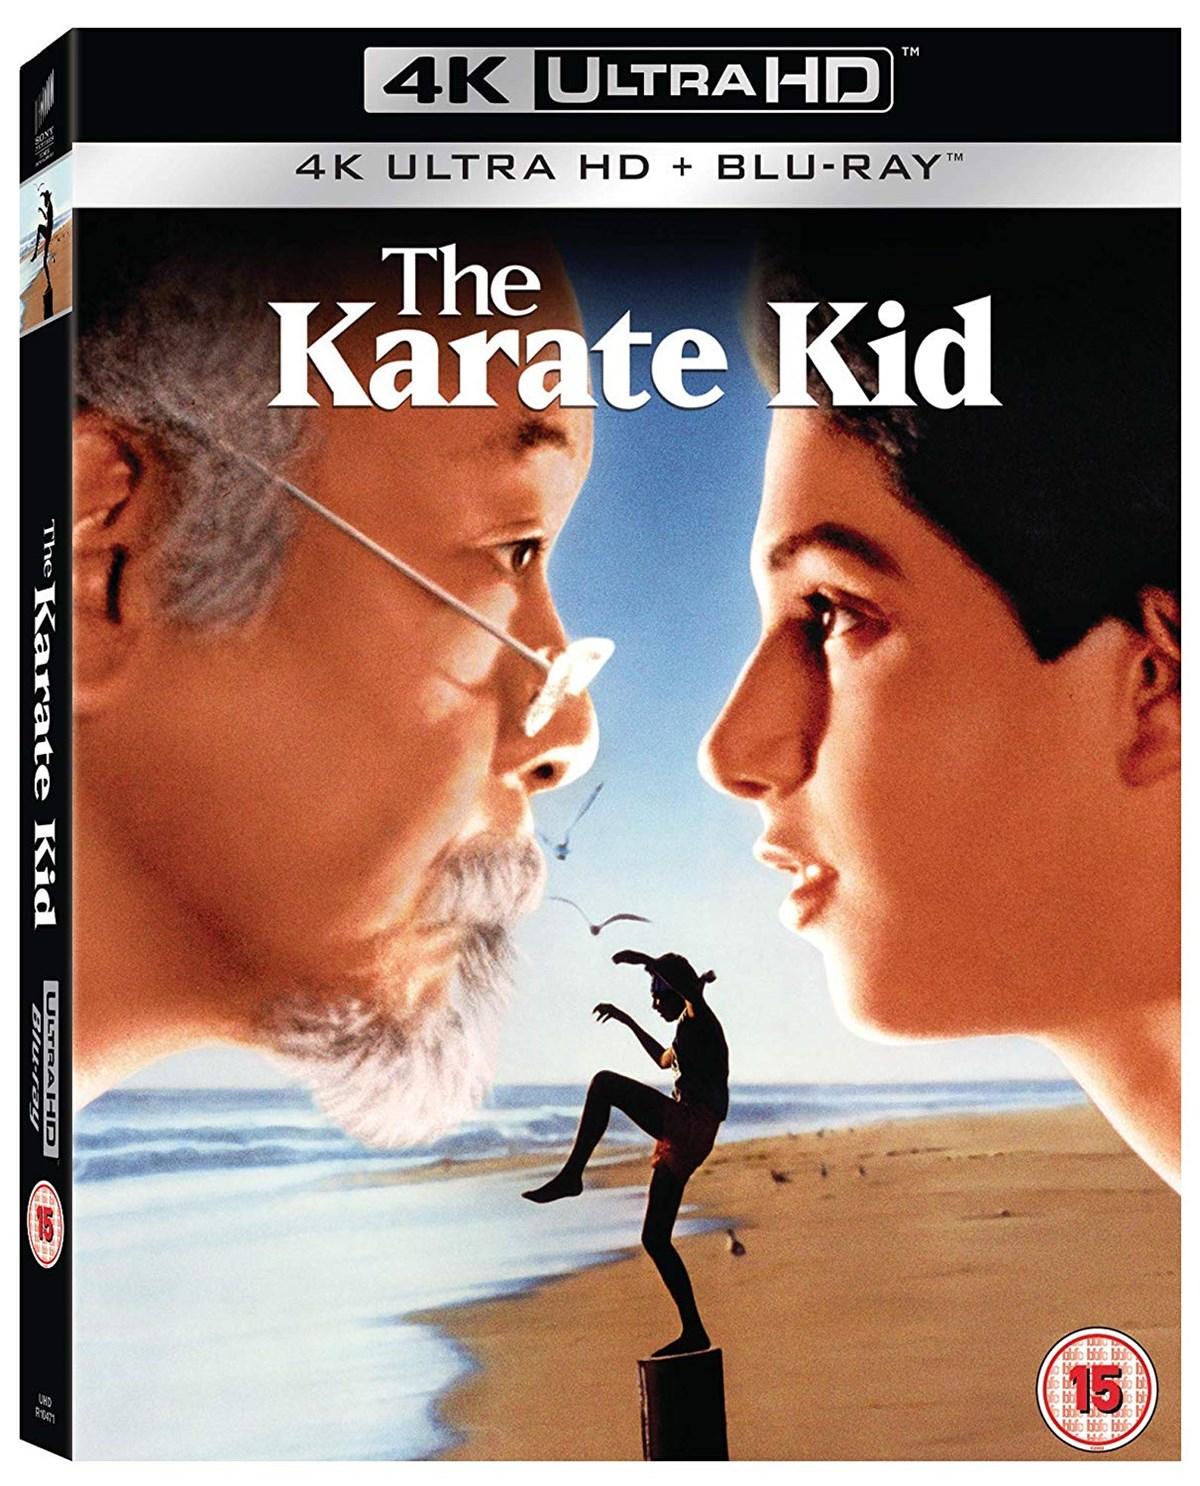 The Karate Kid 4K UHD Blu-Ray £9.99 @ Zoom